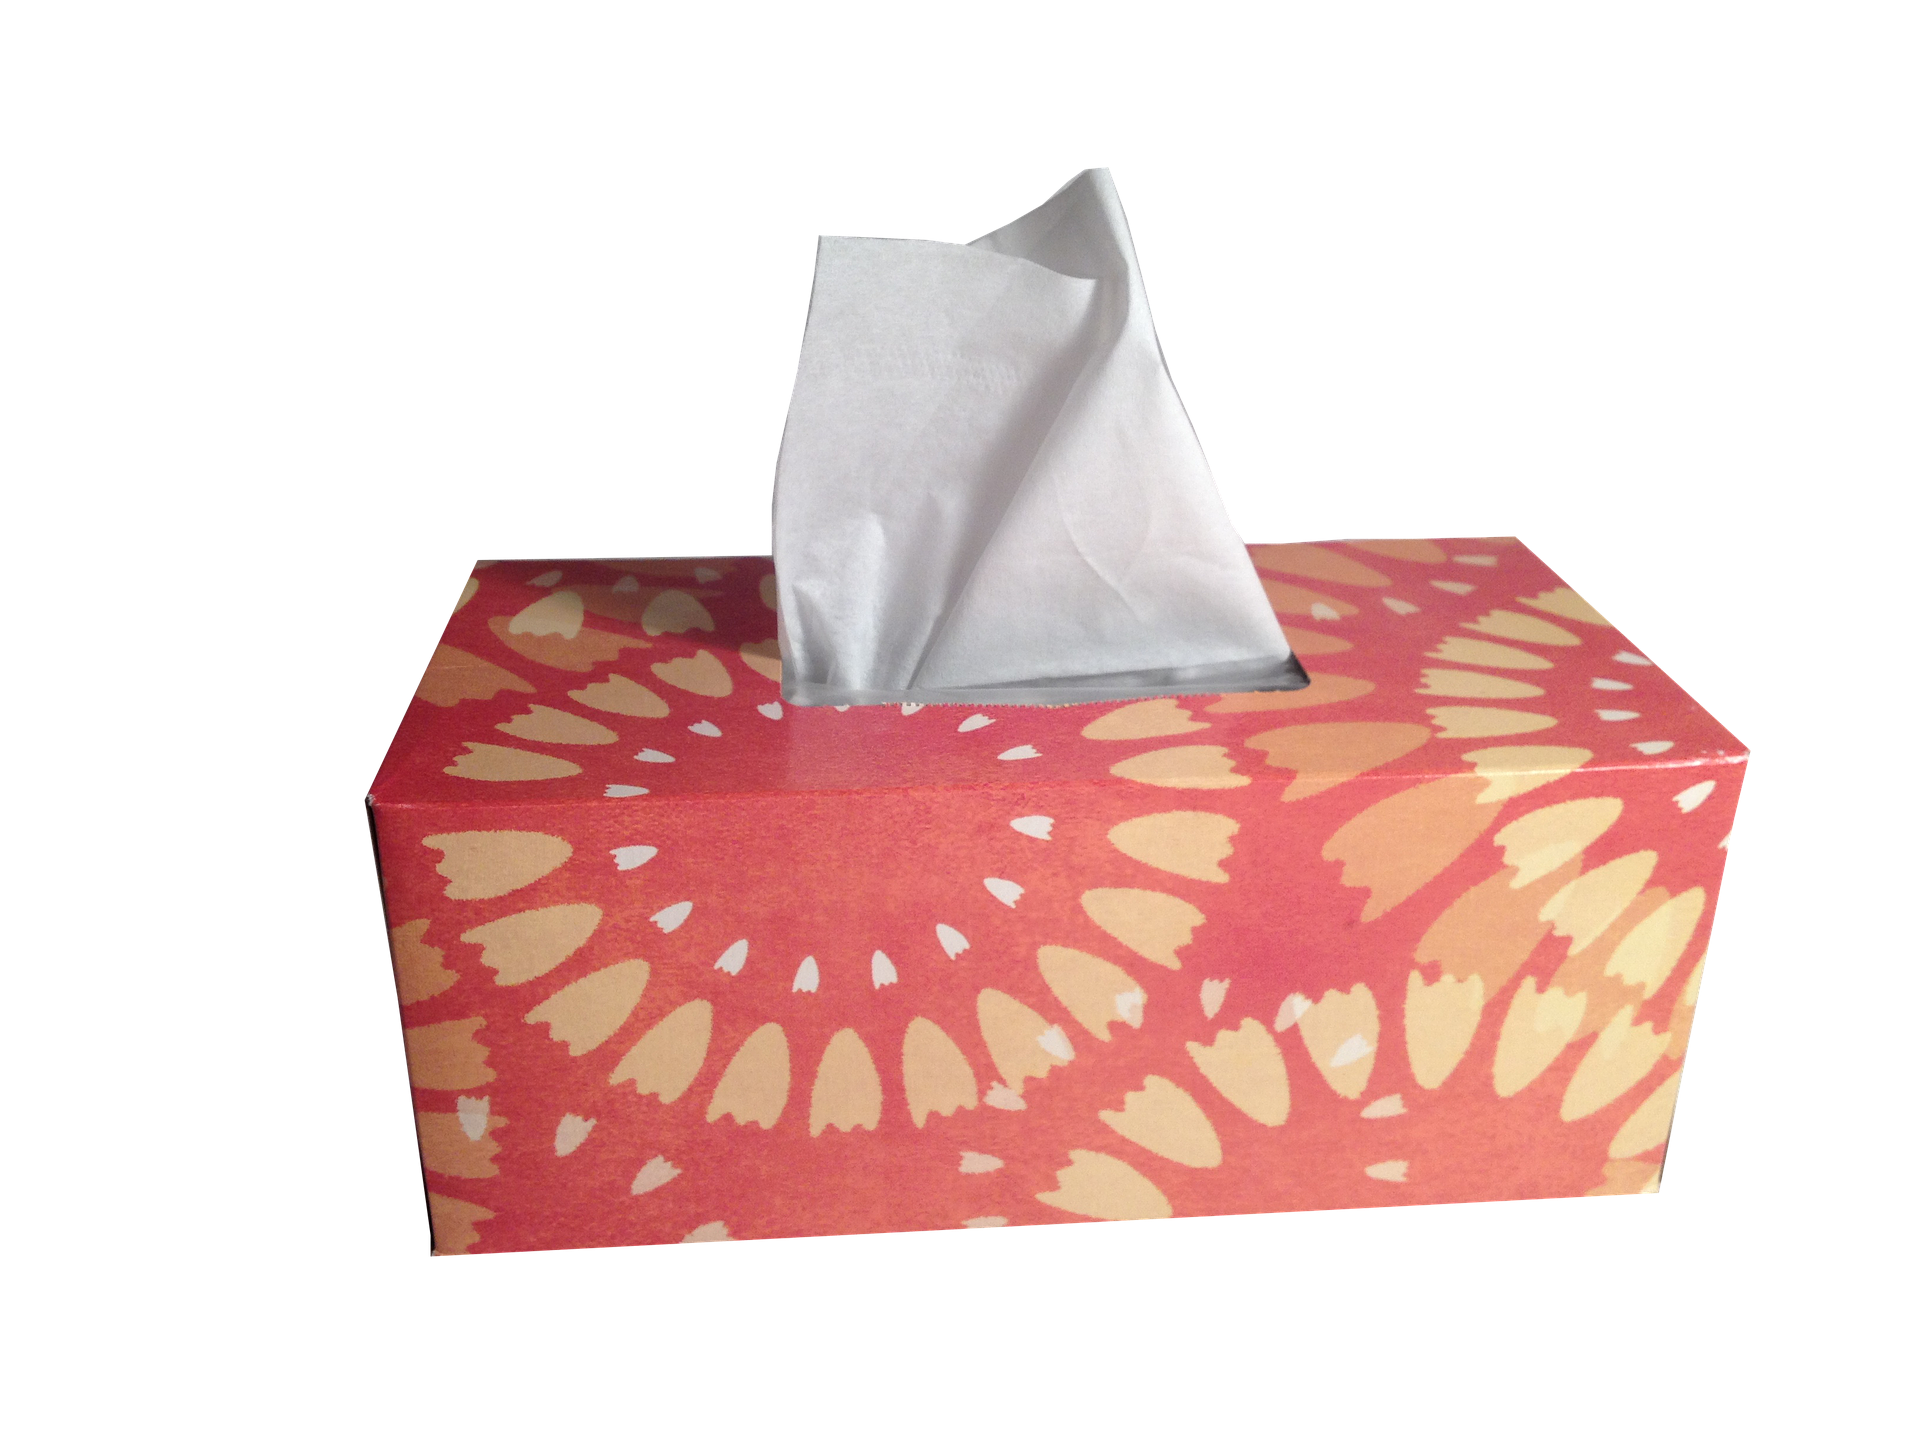 Suka Membersihkan Wajah dengan Tisu Basah? Ini 3 Efek Sampingnya - JPNN.com